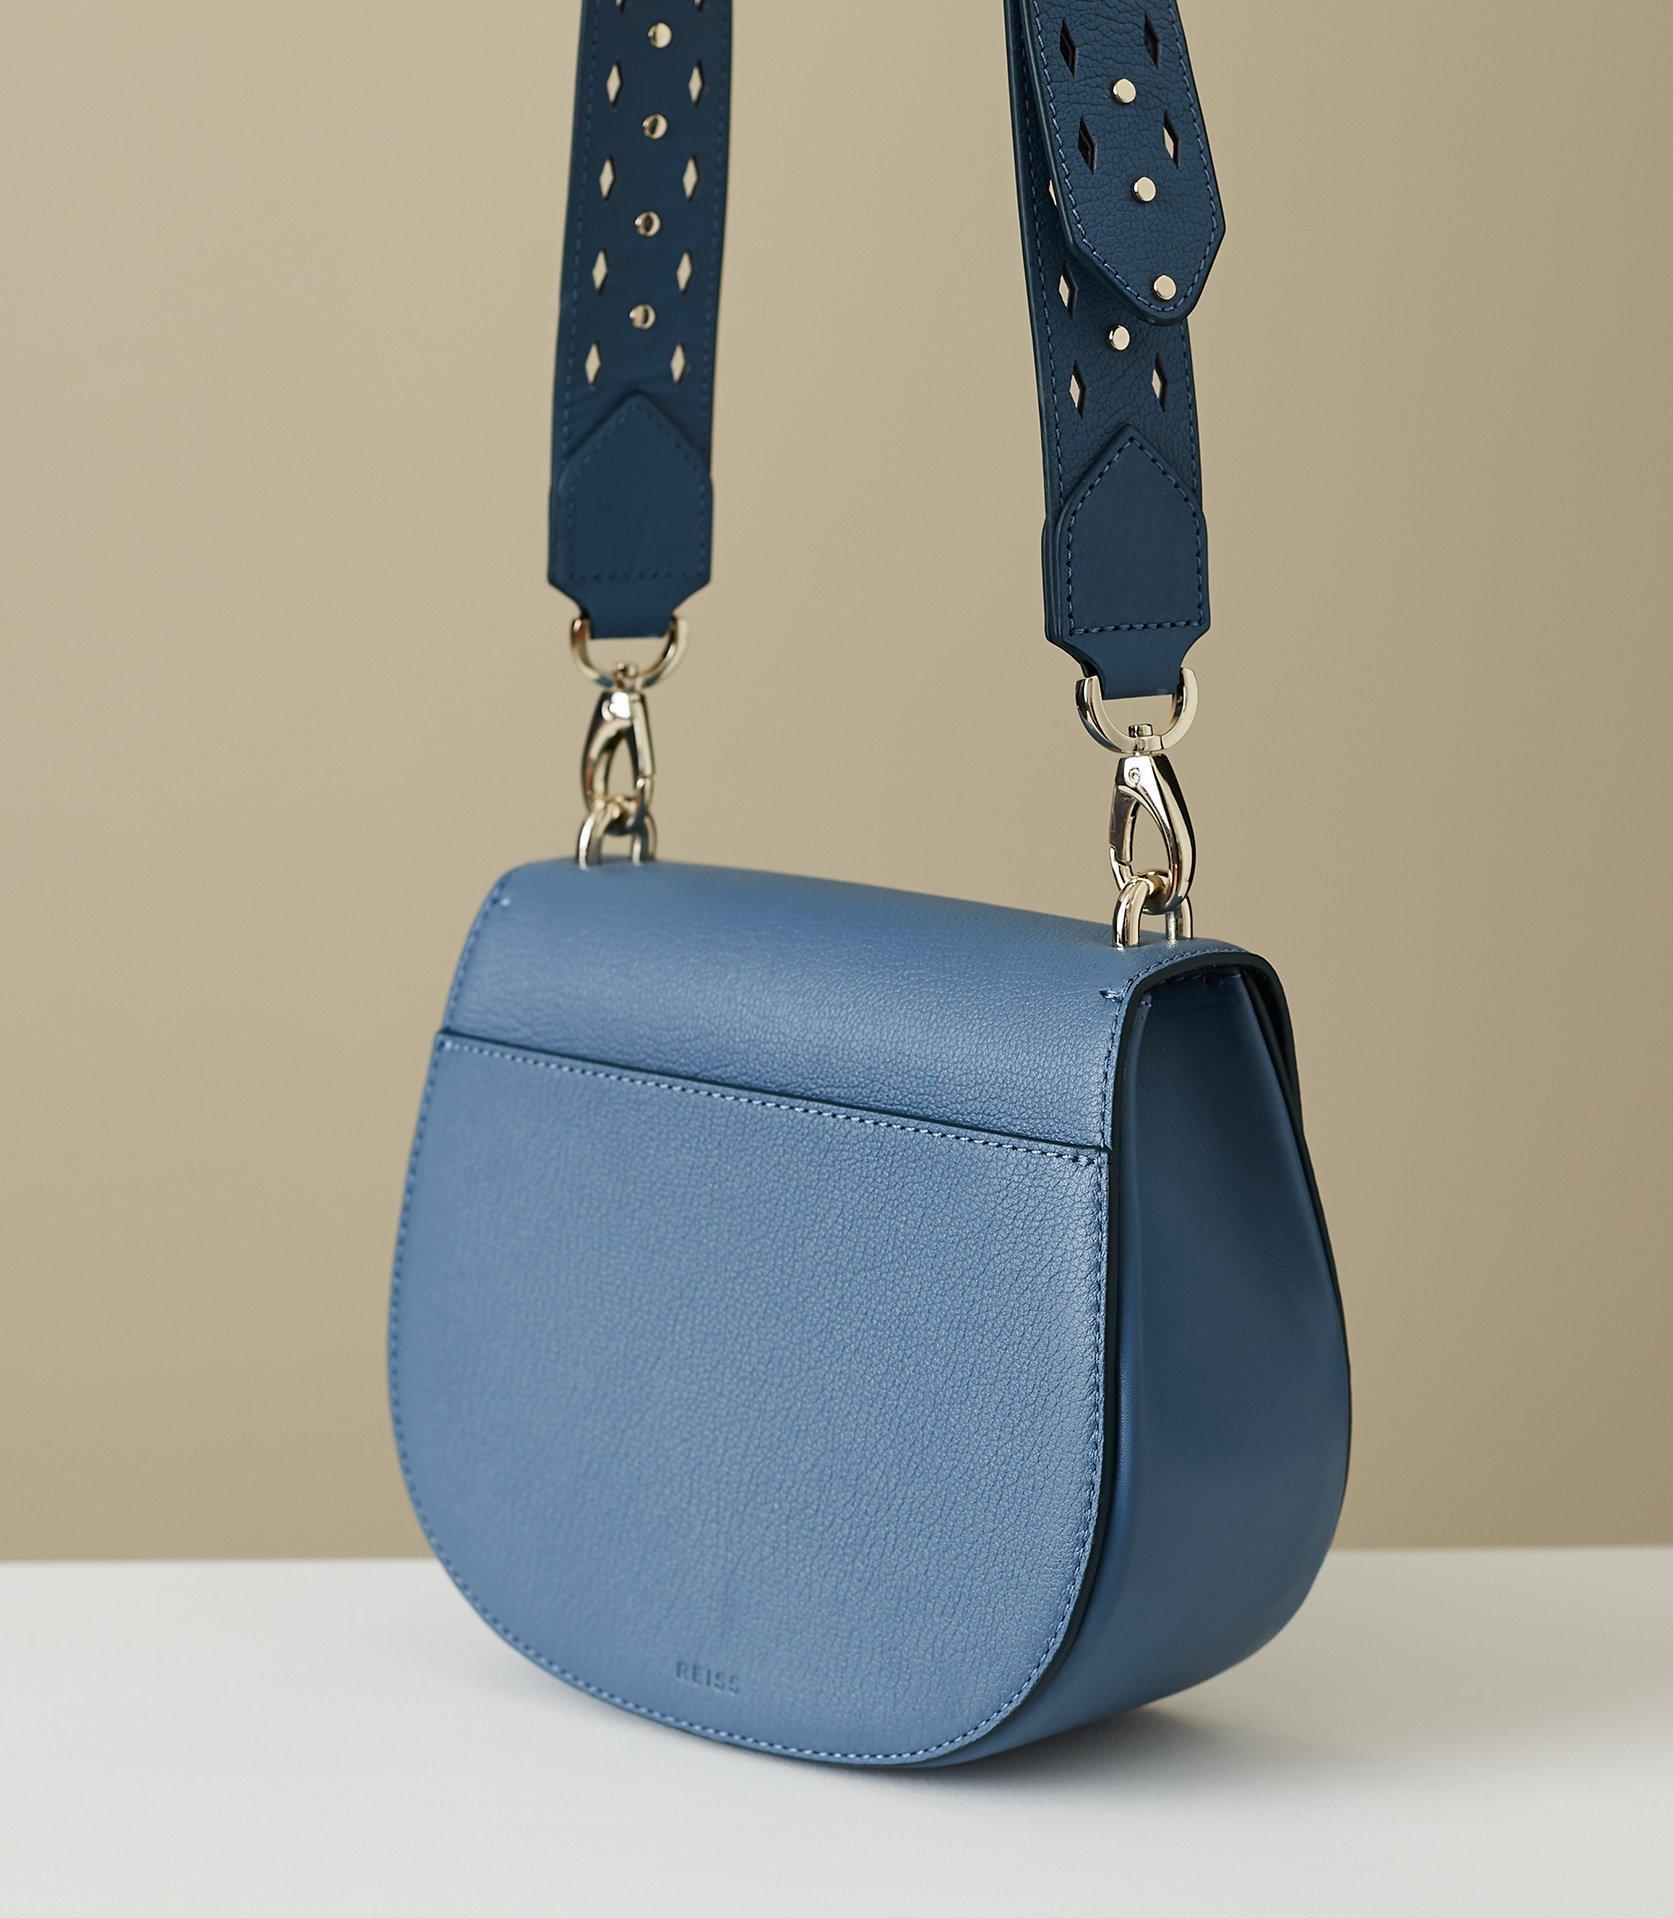 acd460262354 Reiss - Blue Maltby - Leather Cross-body Bag - Lyst. View fullscreen